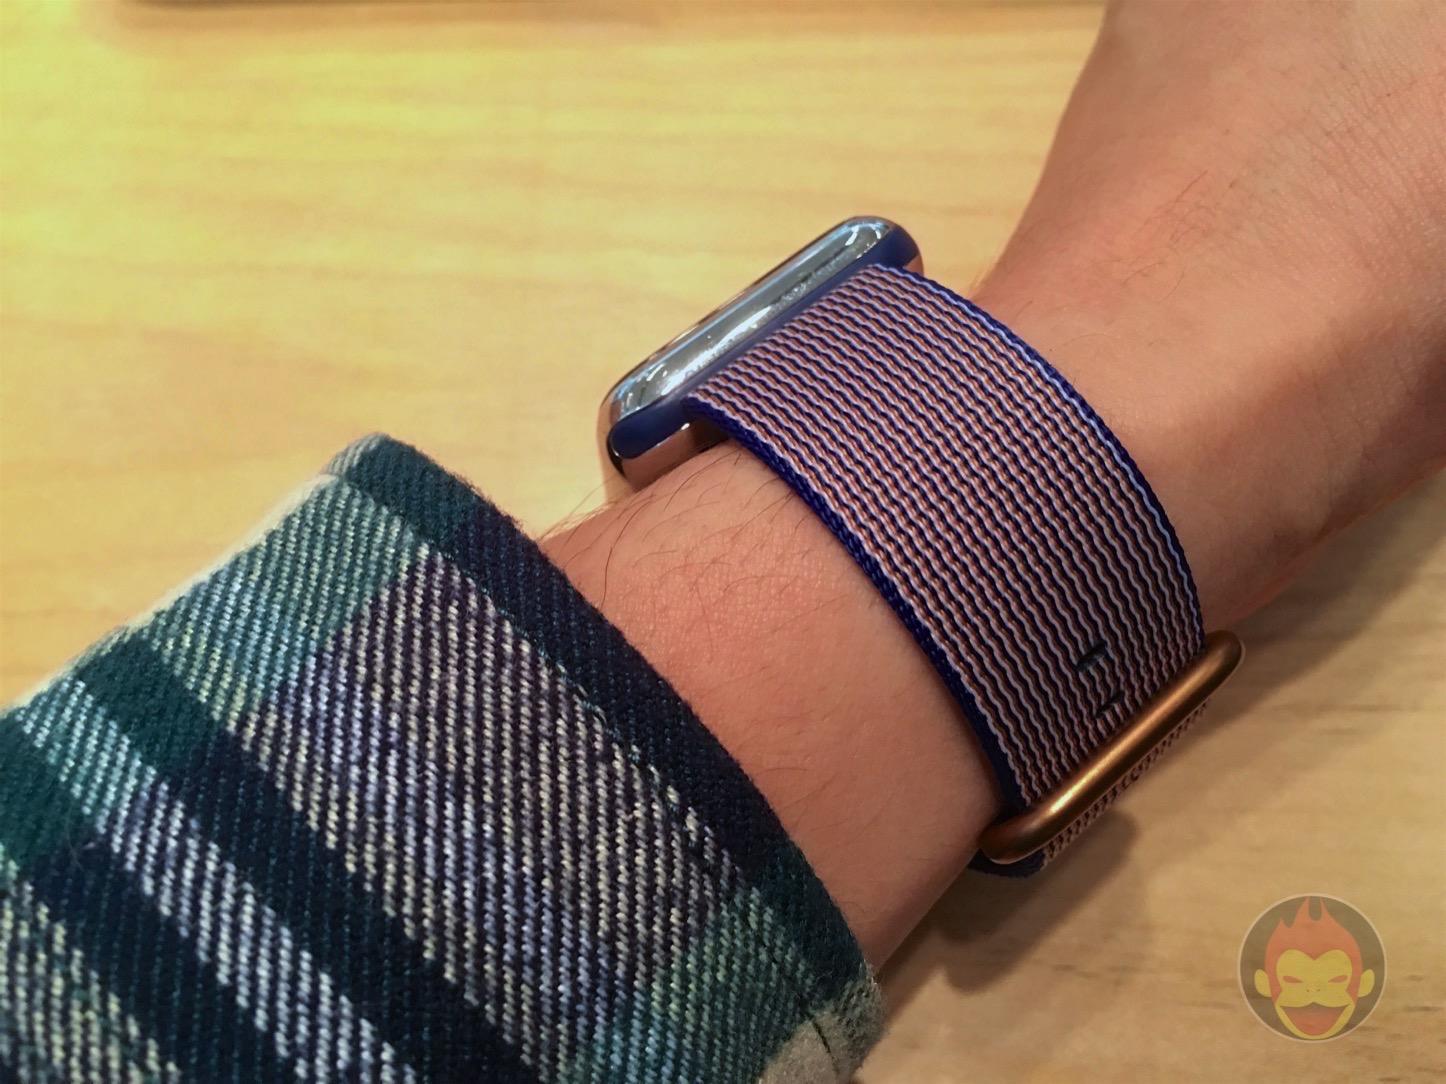 Apple-Watch-Woven-Nylon-Band-14.jpg